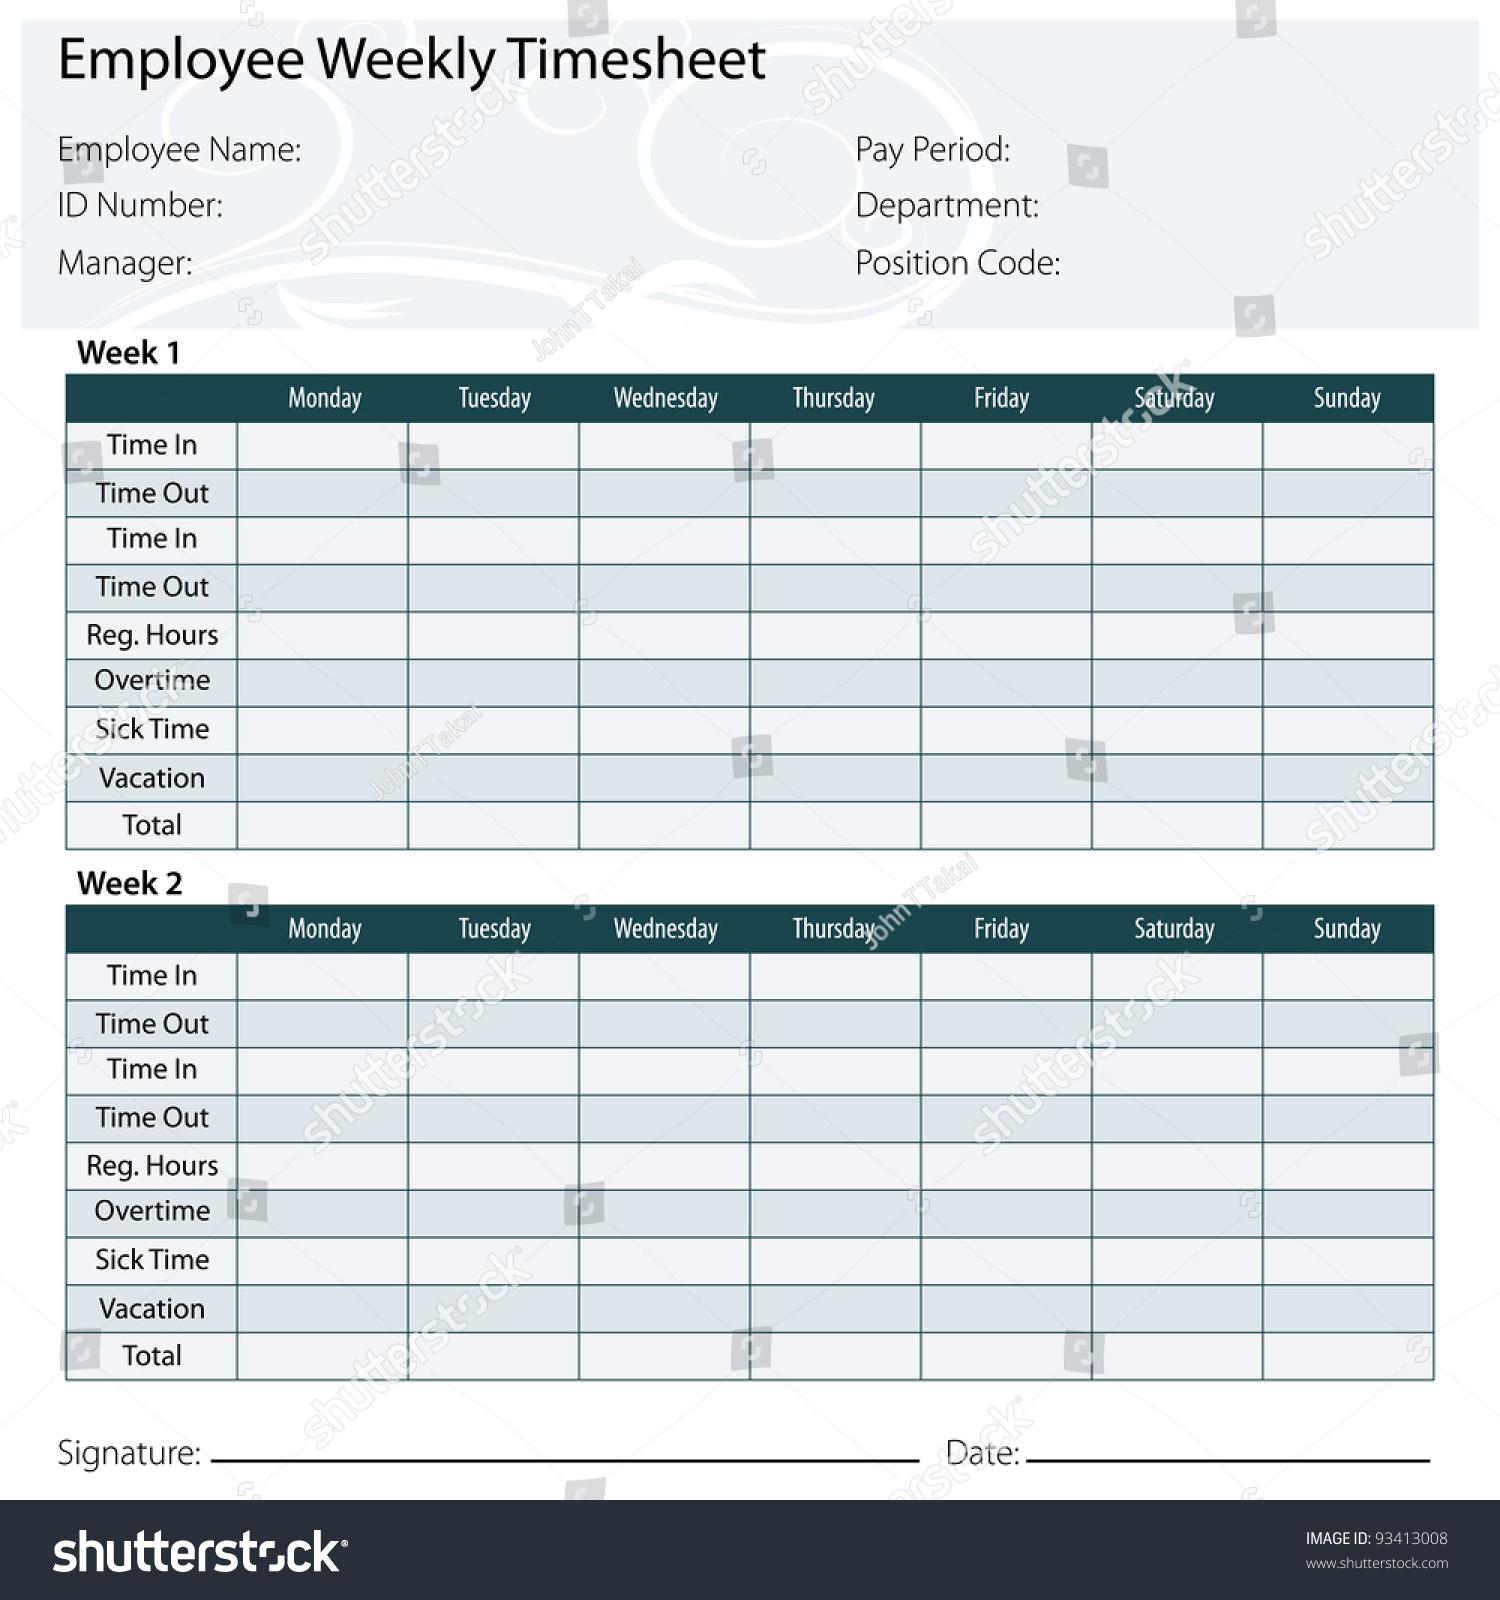 Timesheet Design free ticket generator flight scheduler sample resume – Timesheet Design